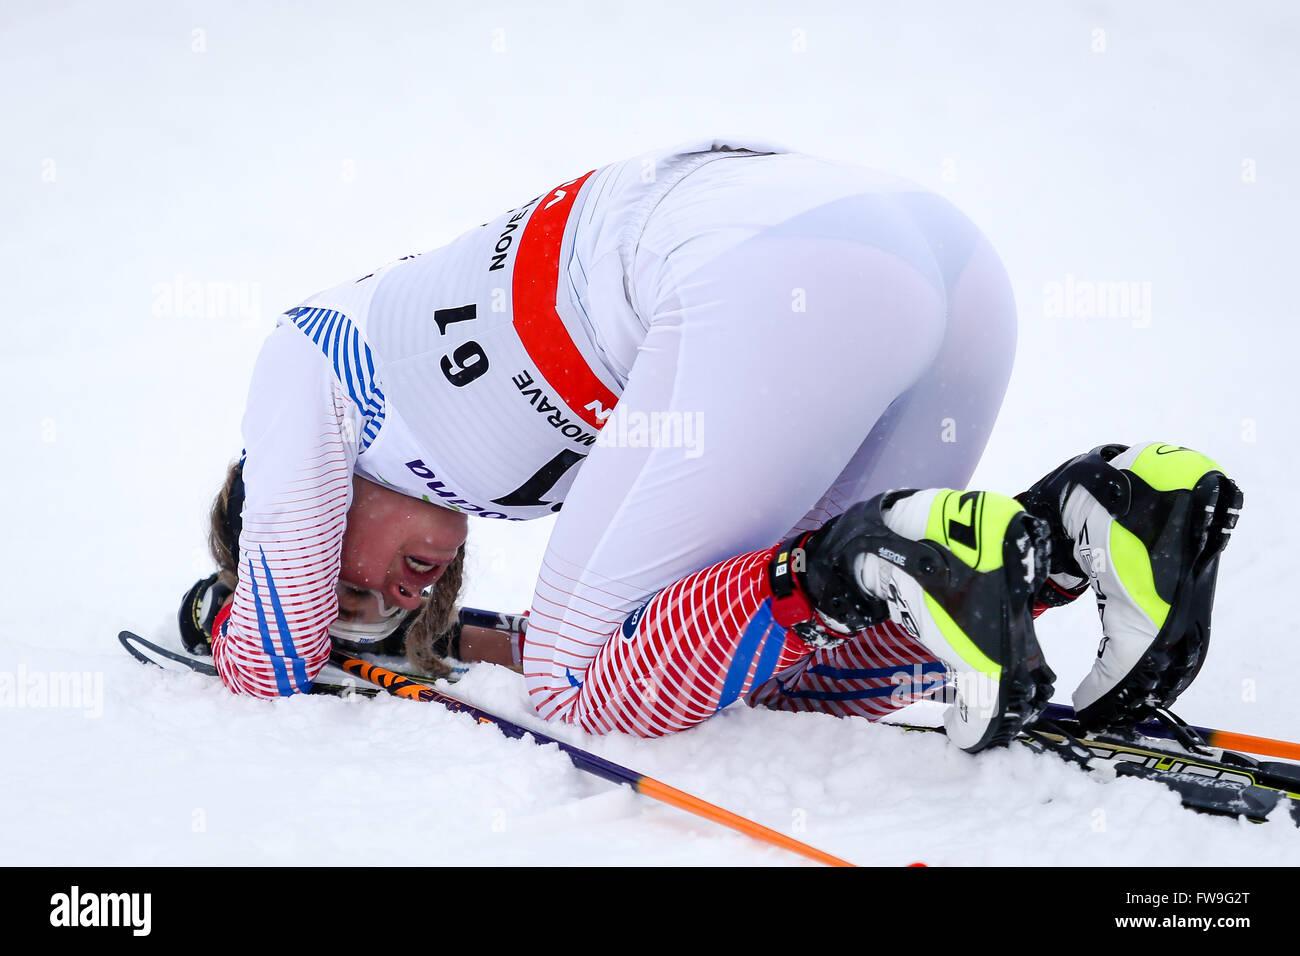 Nove Mesto na Morave, Czech Republic - January 23, 2016: FIS Cross Country World Cup, women 10km. KLEMENTOVA Andrea - Stock Image